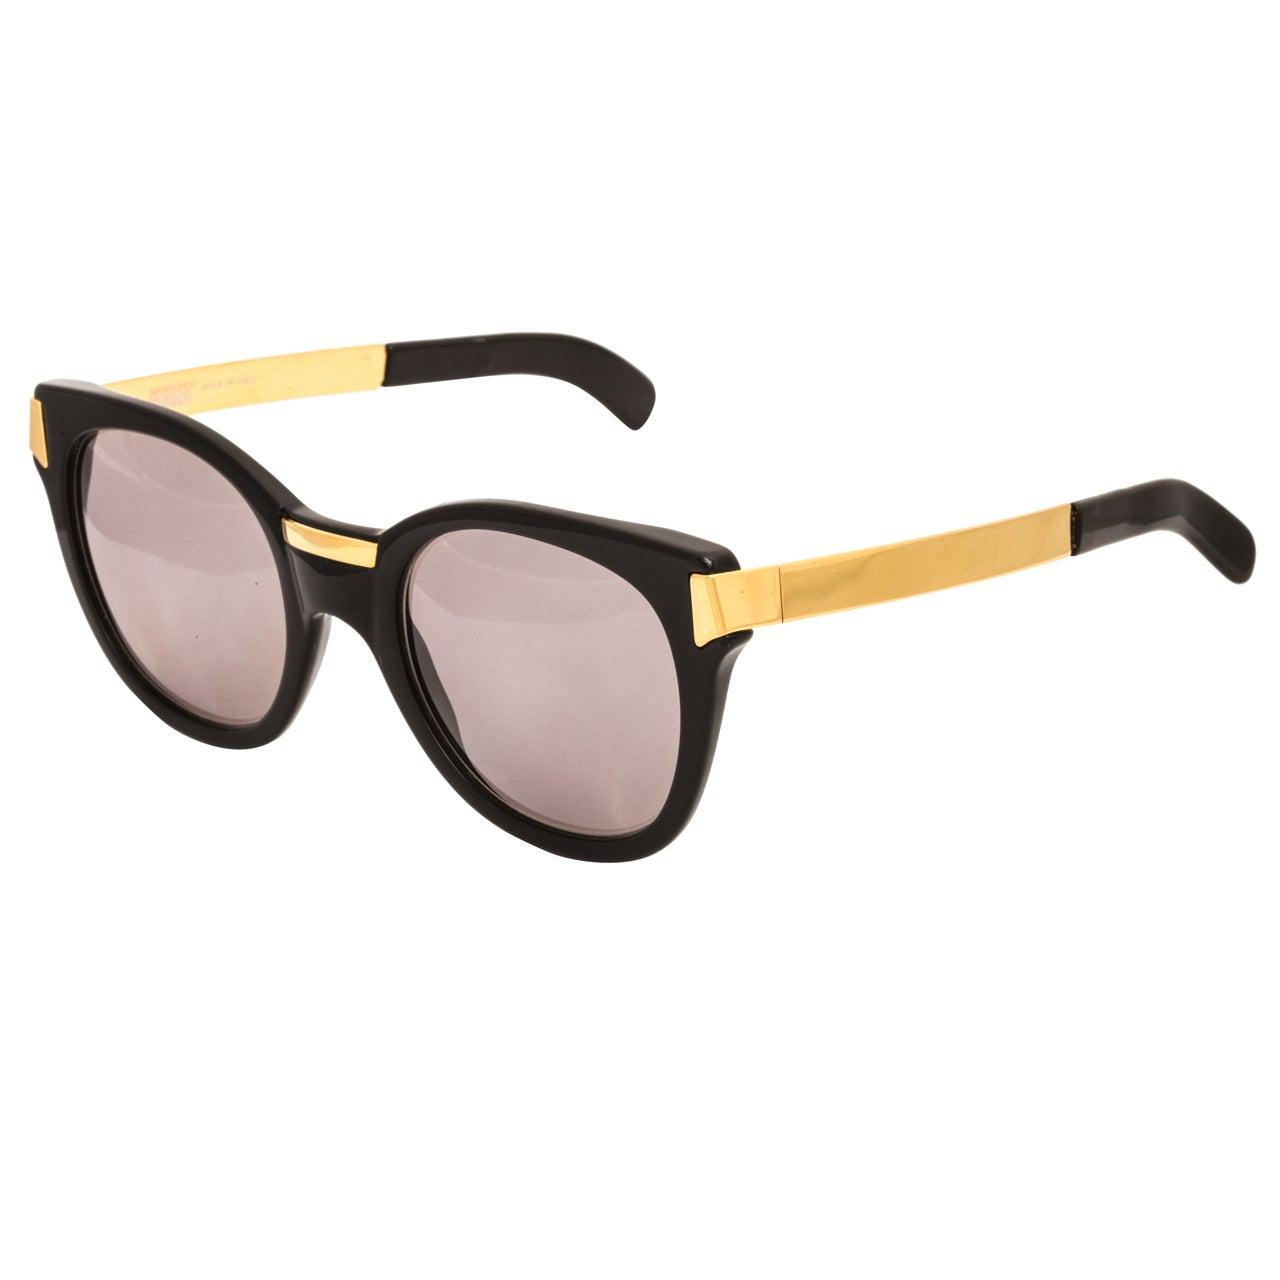 Gianfranco Ferre Vintage Sunglasses Gff 16/S